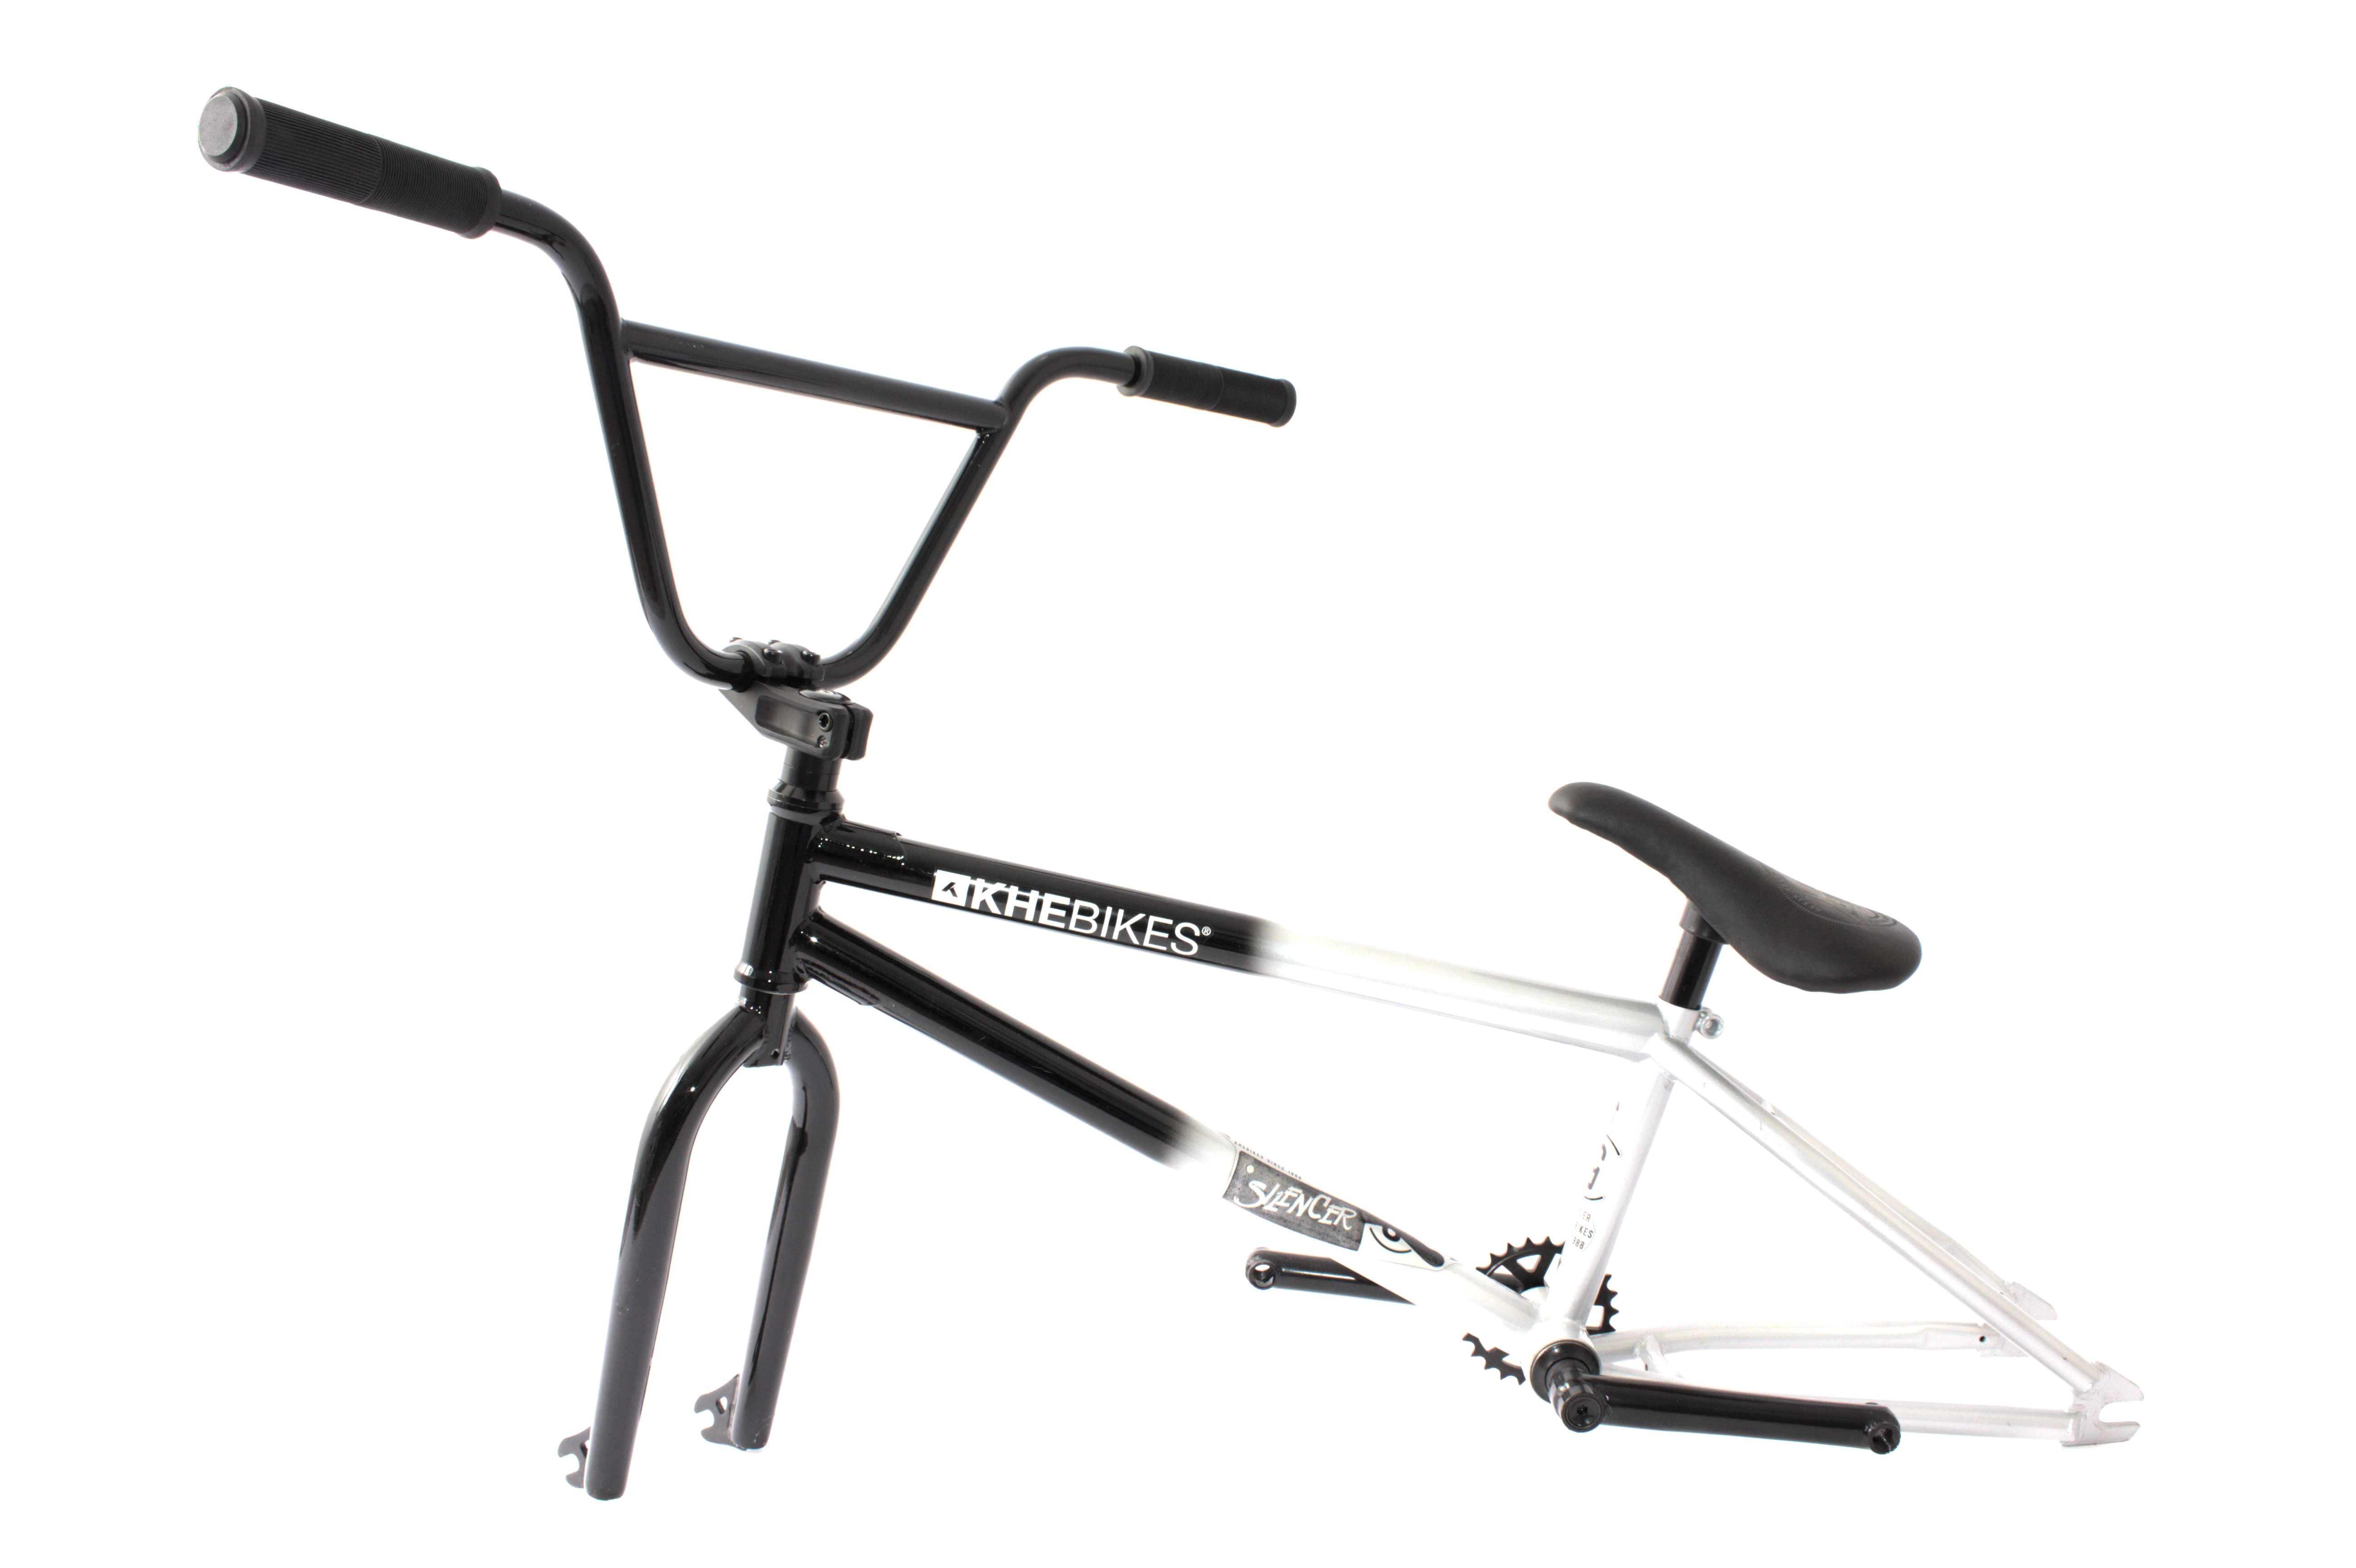 KHE Silencer frame with parts - I4 | Frame | BMX Parts | Official ...